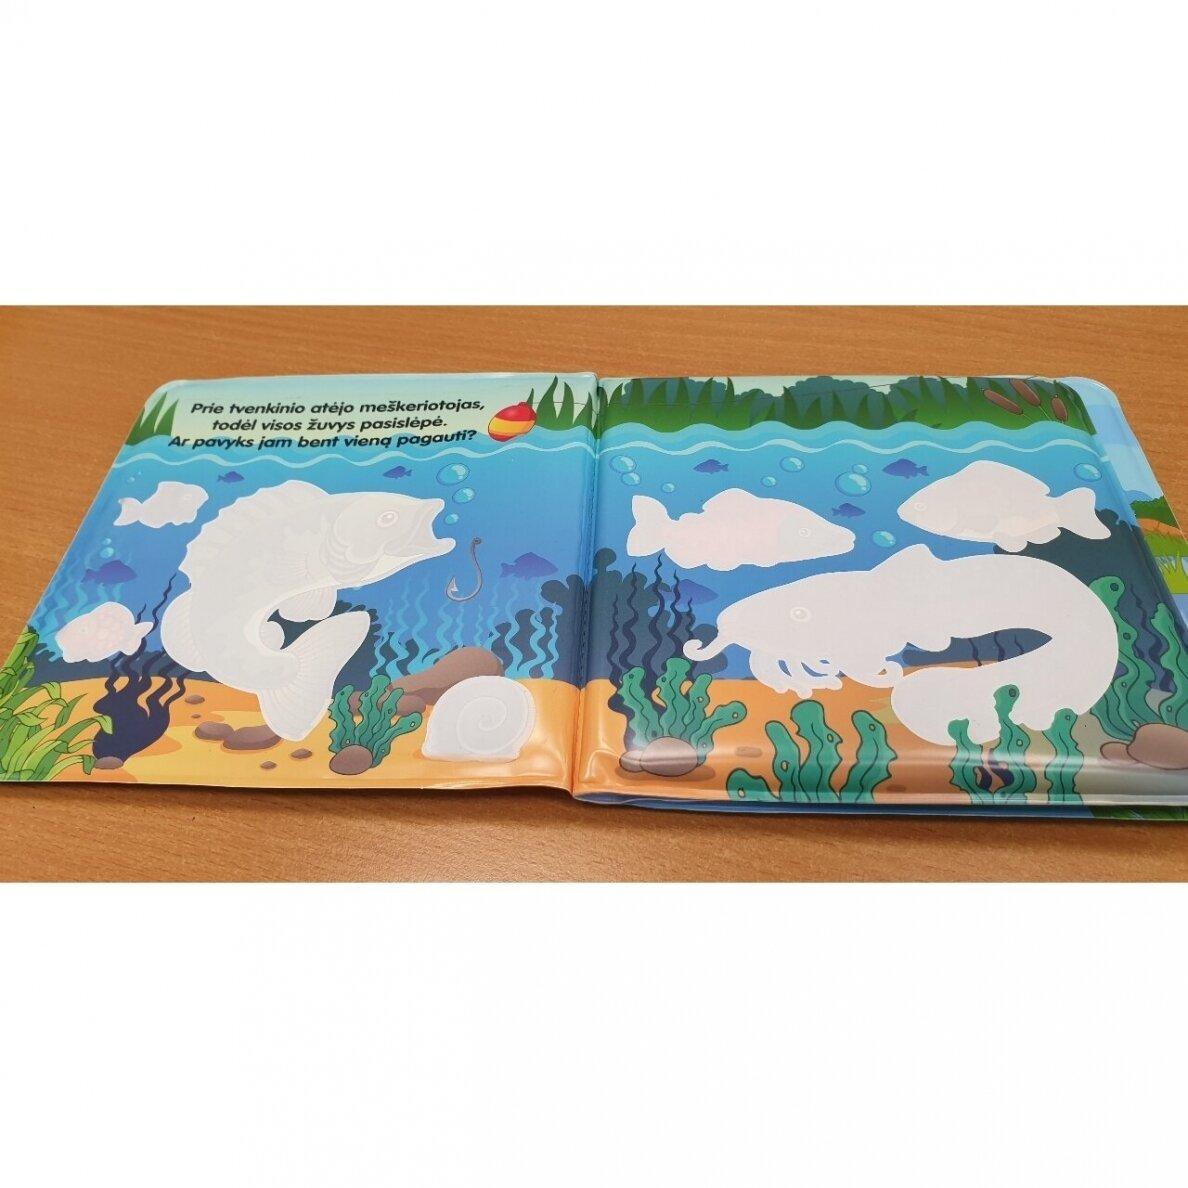 Vonios knygelė. Smagu plaukti. Nuspalvink vandeniu! |